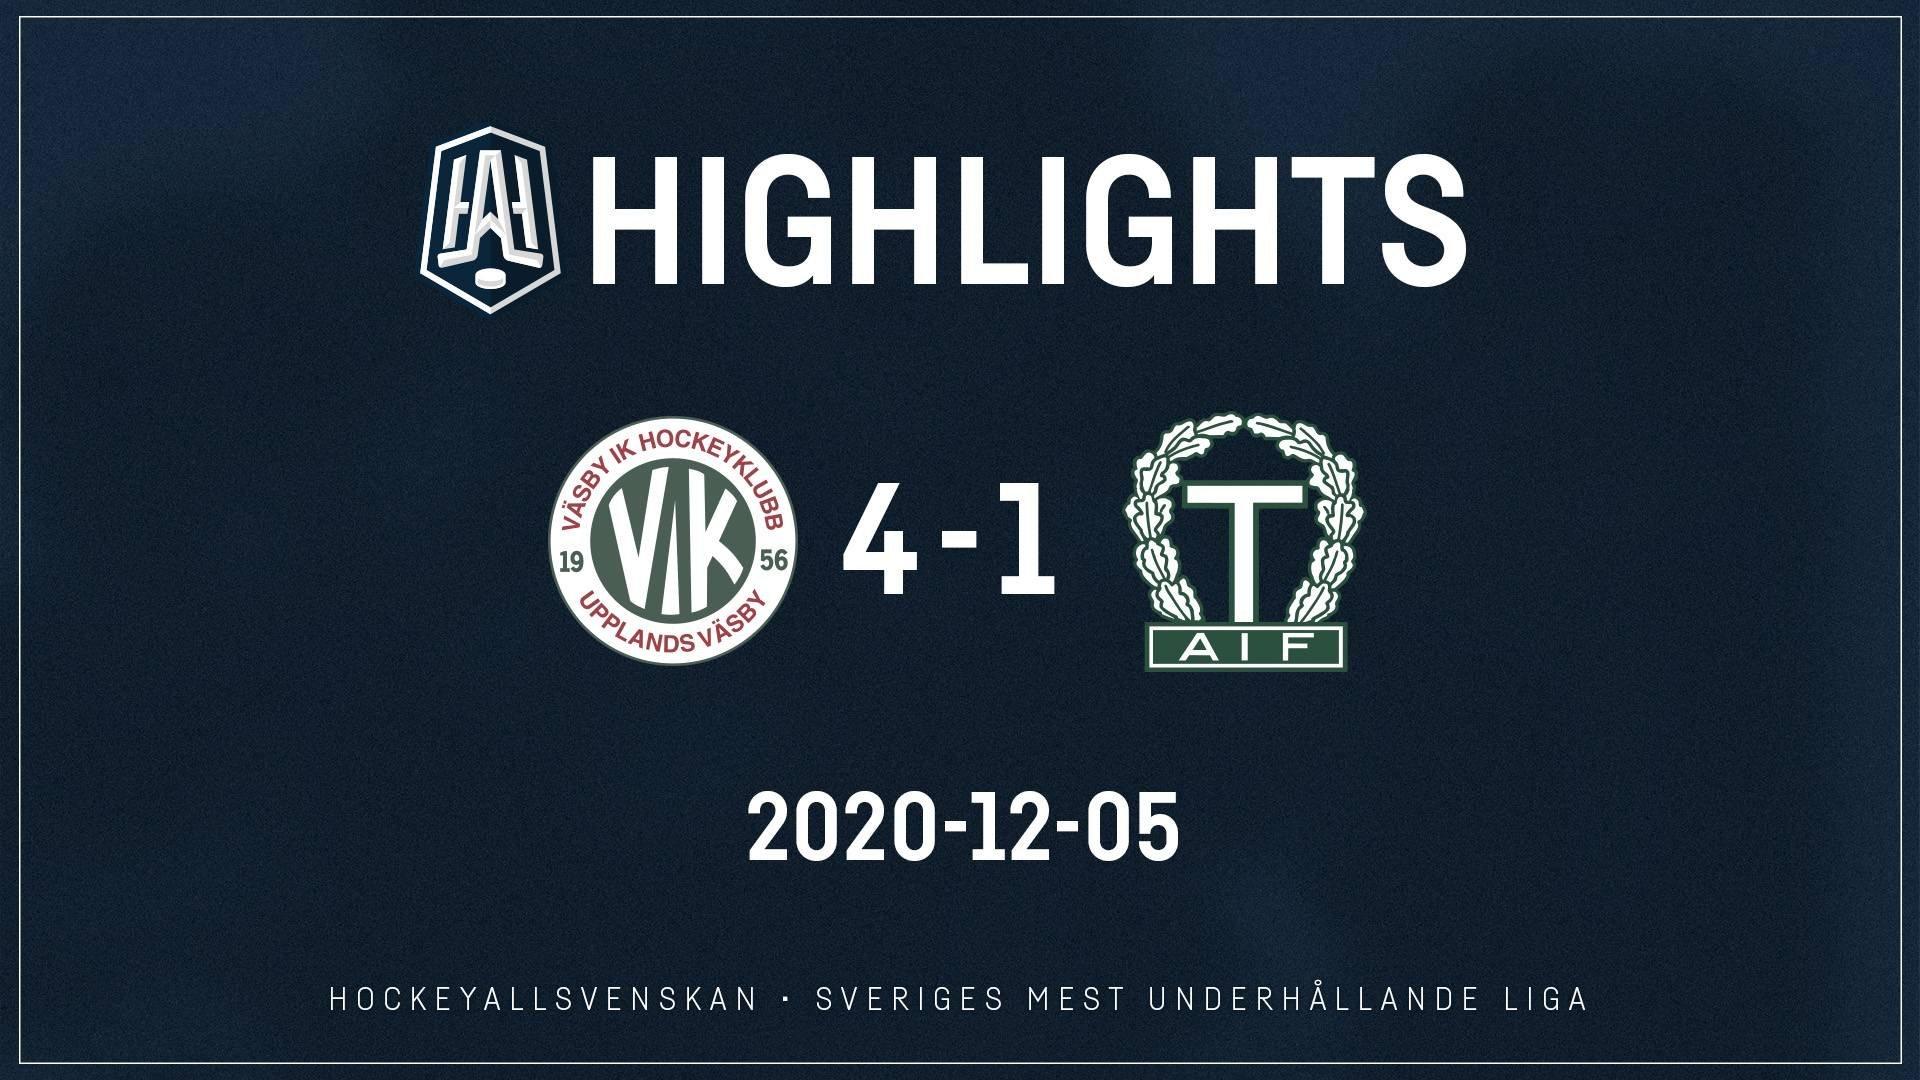 2020-12-05 Väsby - Tingsryd 4-1